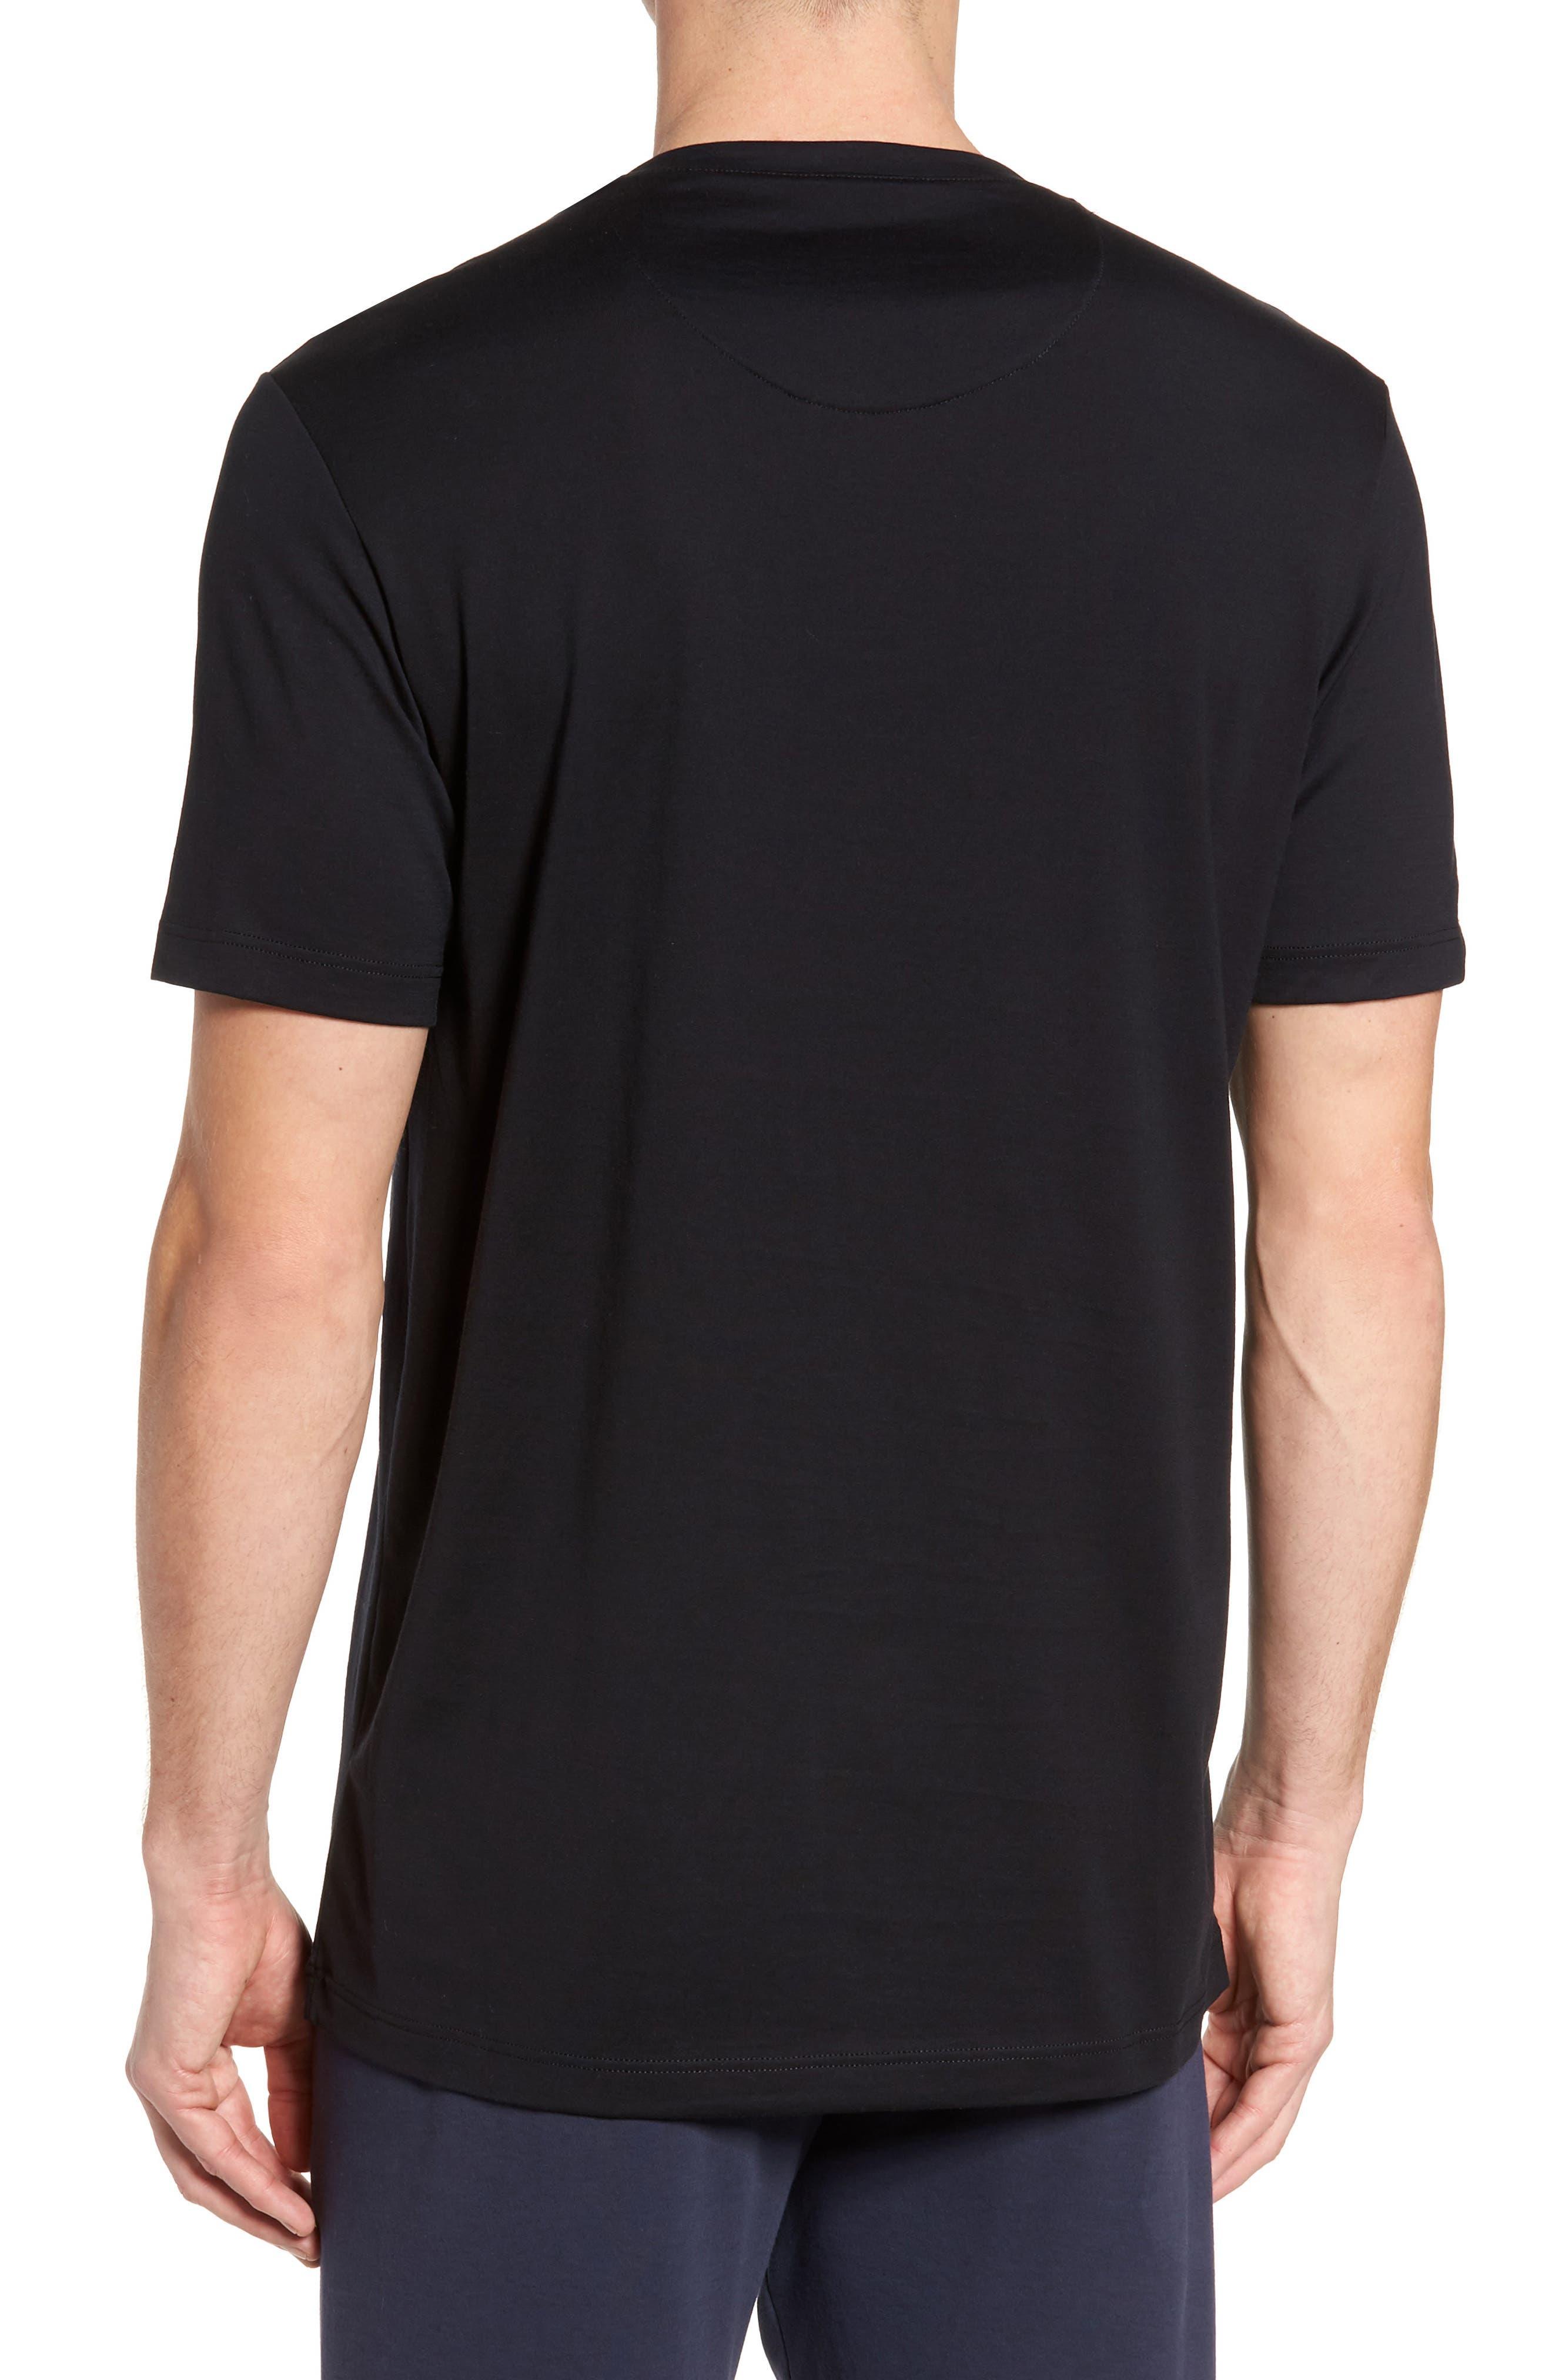 Night & Day Crewneck T-Shirt,                             Alternate thumbnail 2, color,                             BLACK